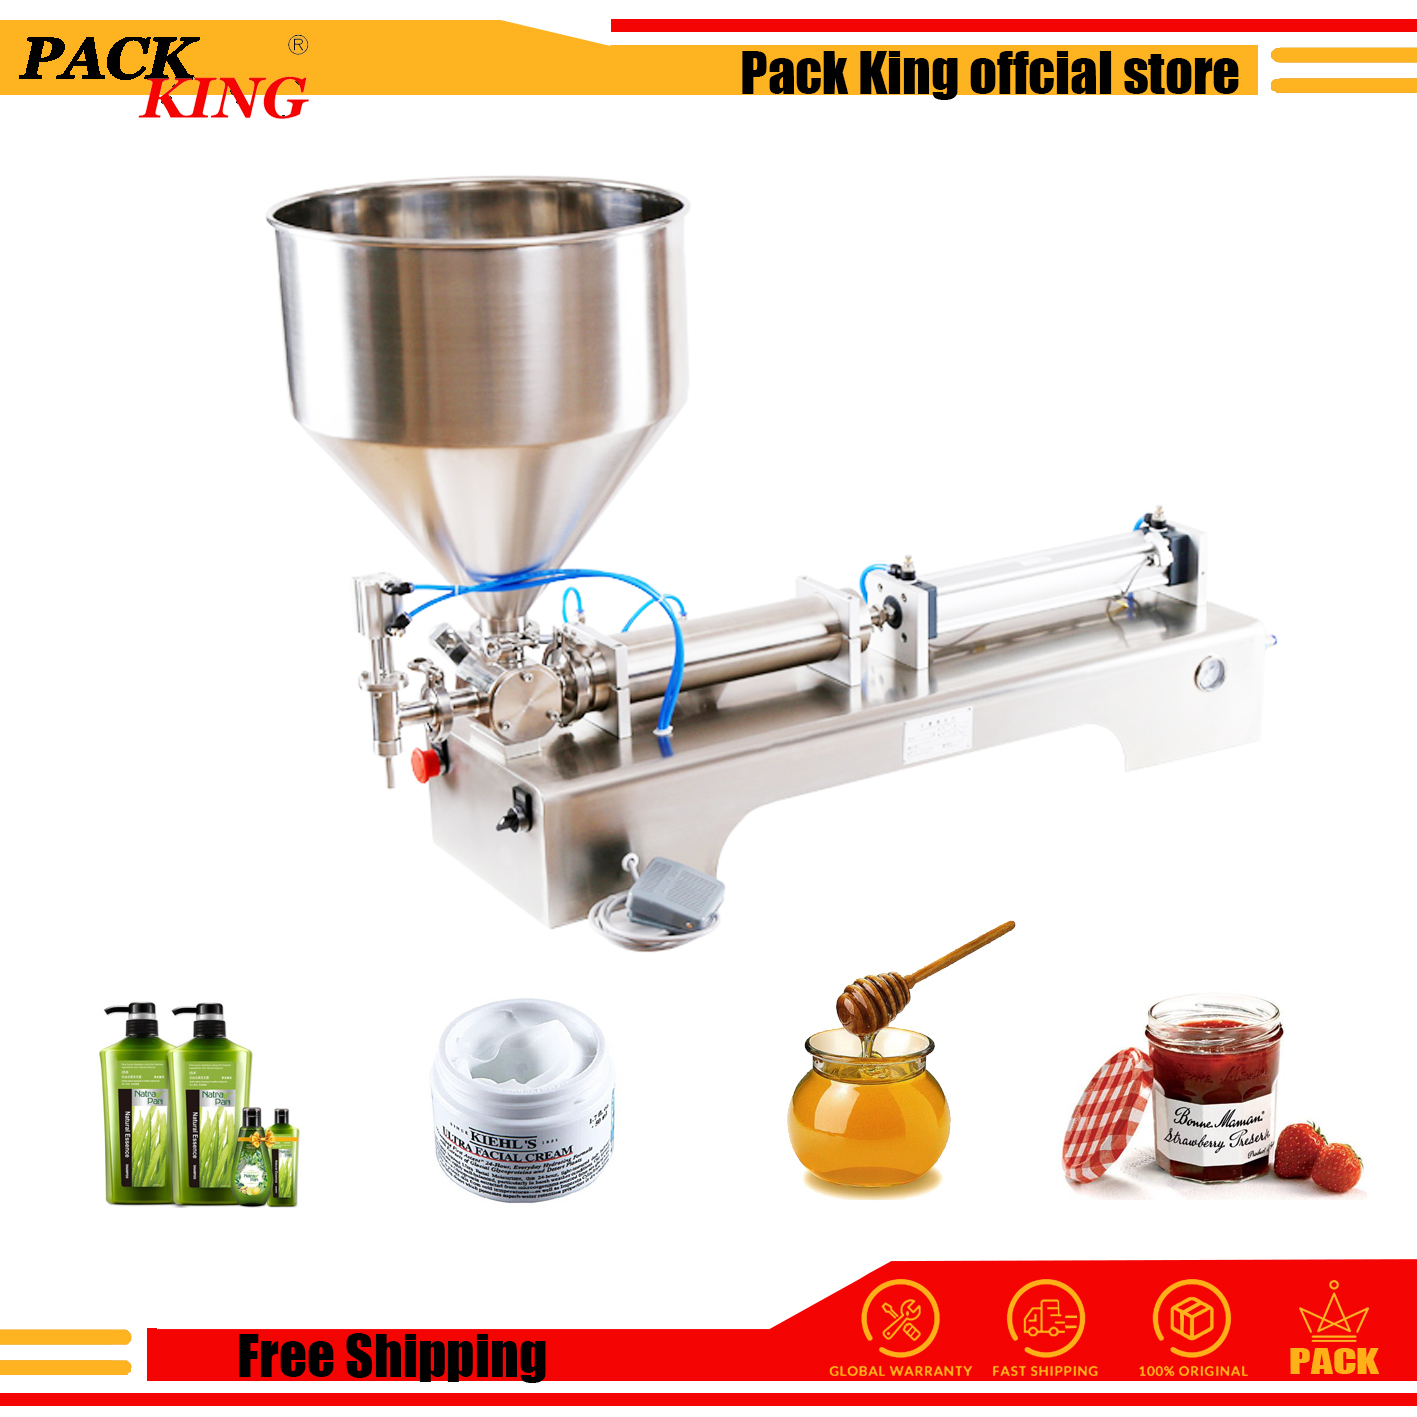 Lotion Shampoo Cream Filler Honey Sauce Paste Peanut Butter Jam Ejuice Tomato Ketchup Filling Machine Pneumatic Free Shipping